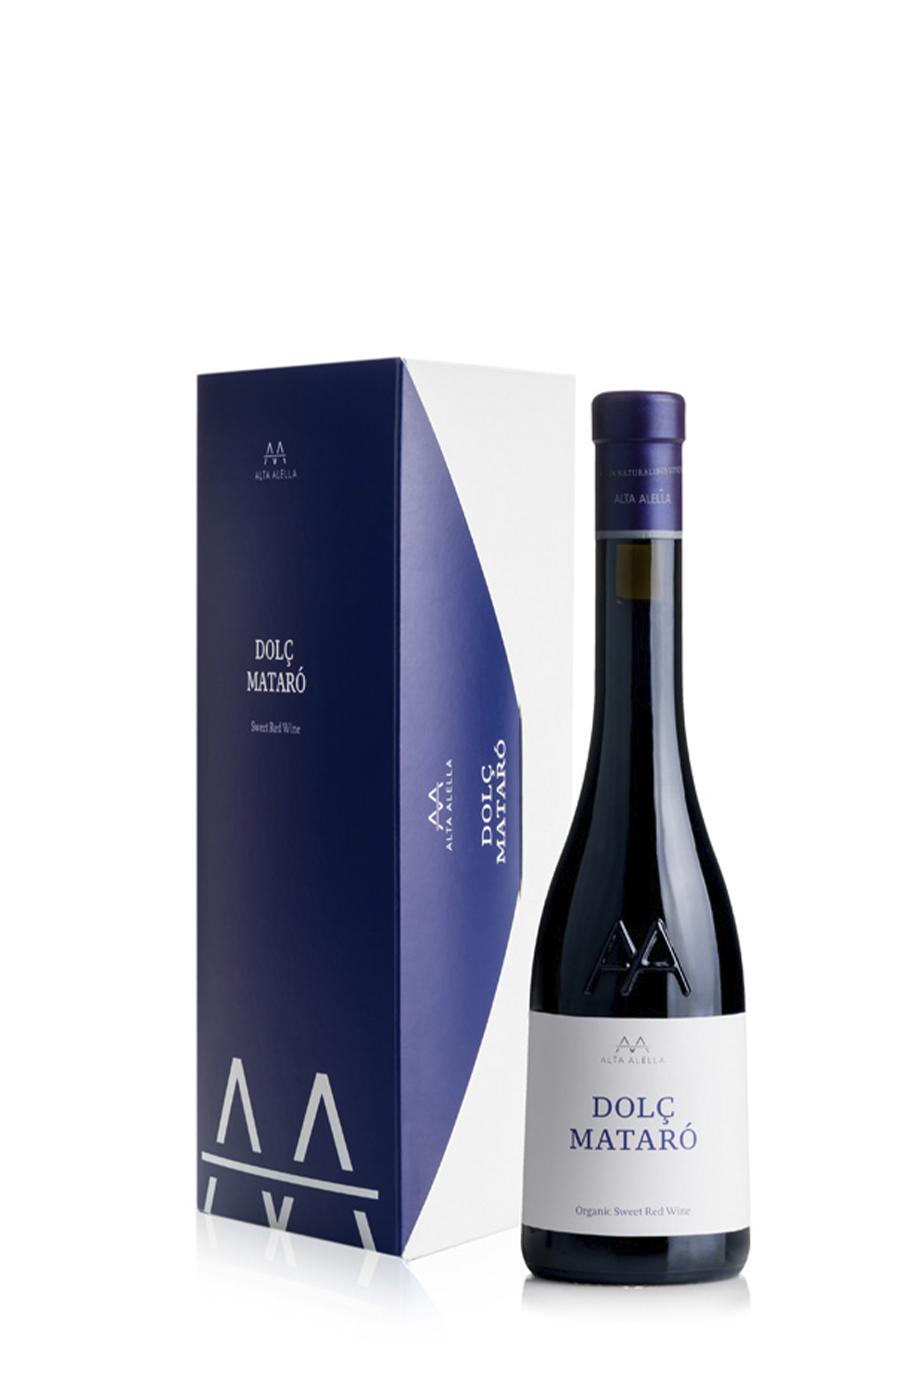 AA Dolç Mataró | Alta Alella  - Winexfood